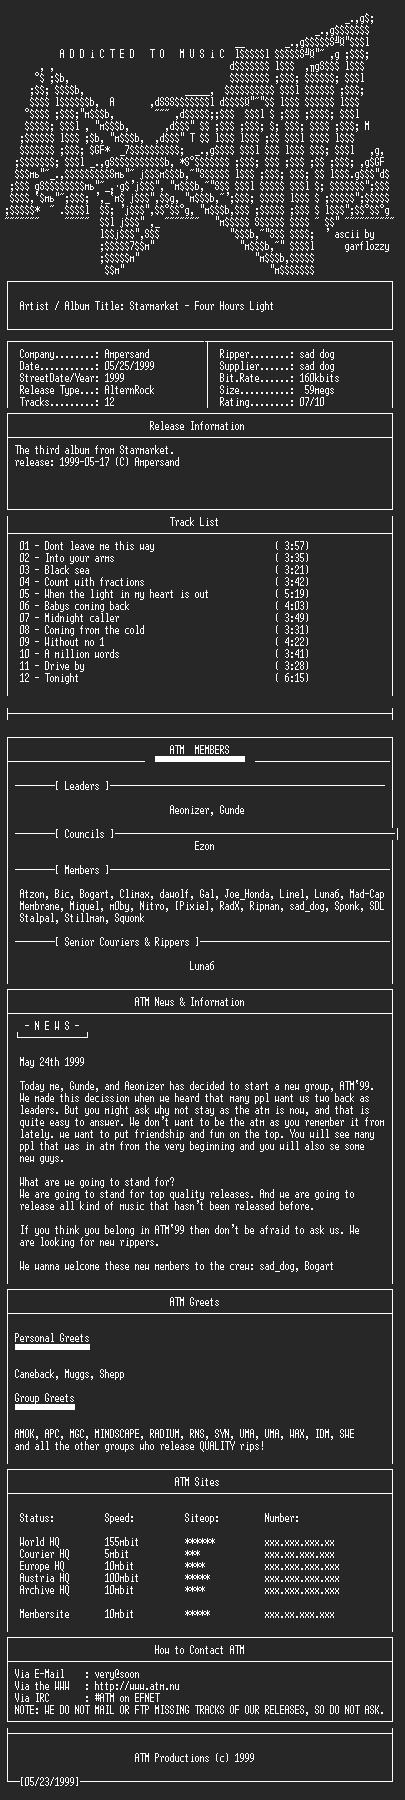 NFO file for Starmarket_-_Four_Hours_Light_(1999)-ATM99